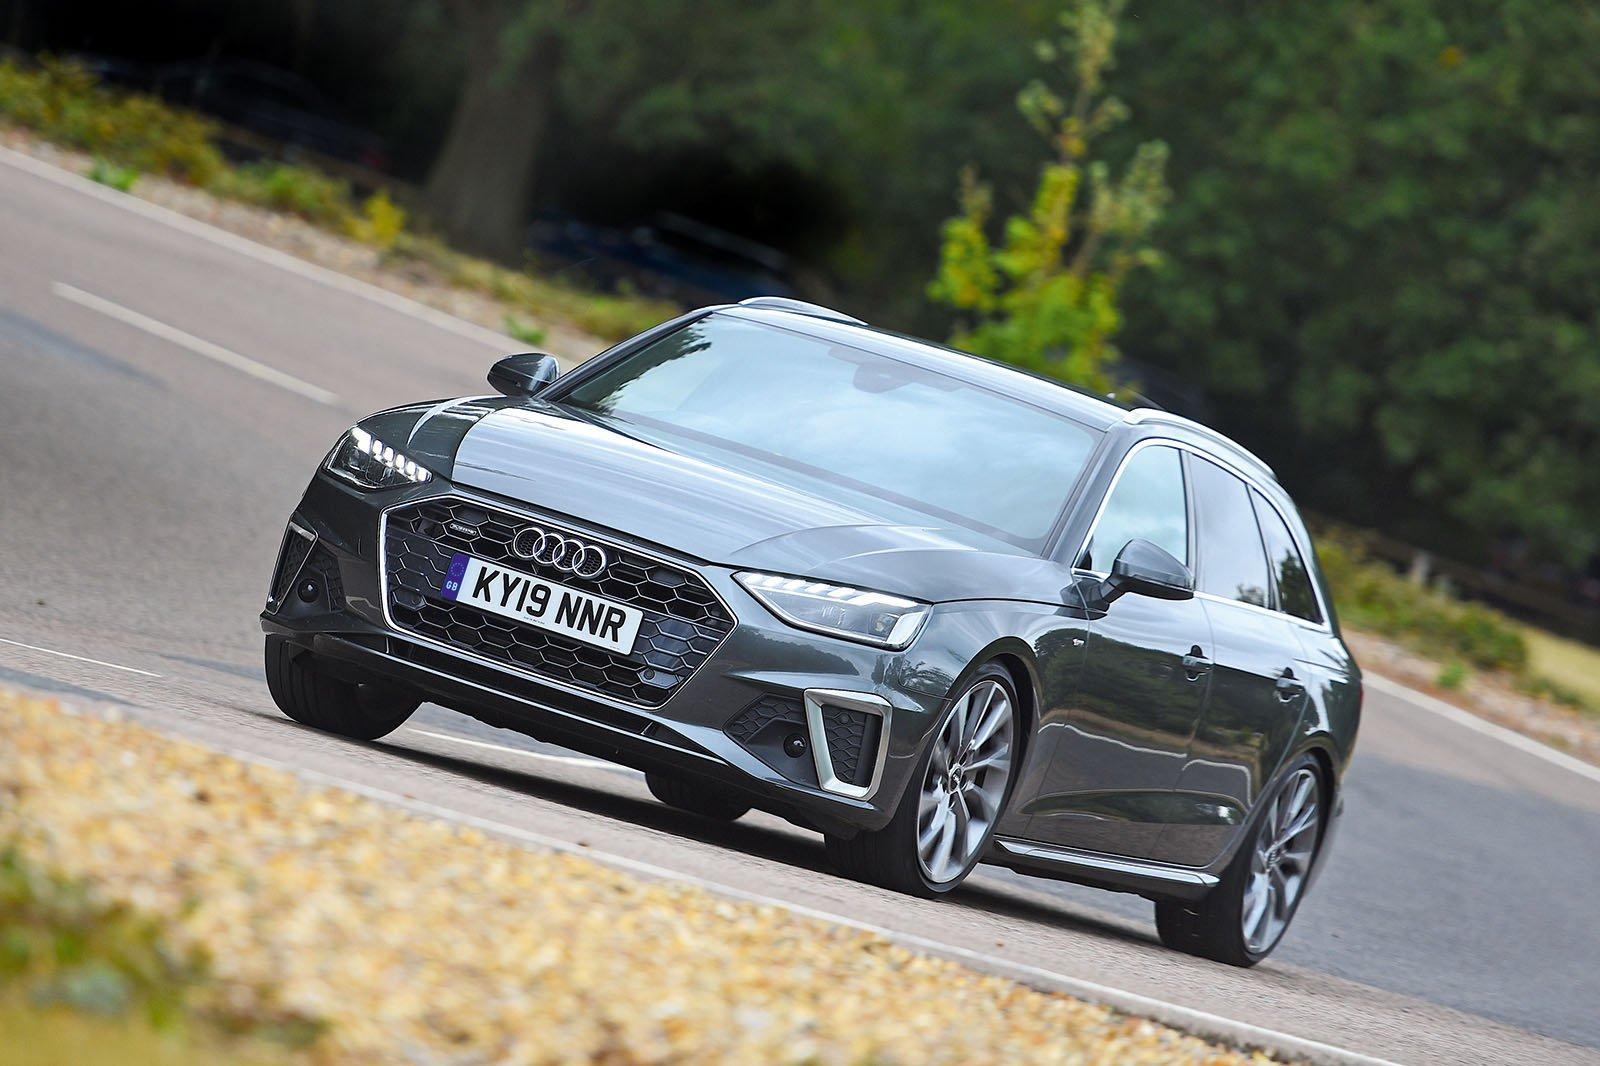 Audi A4 Avant driving